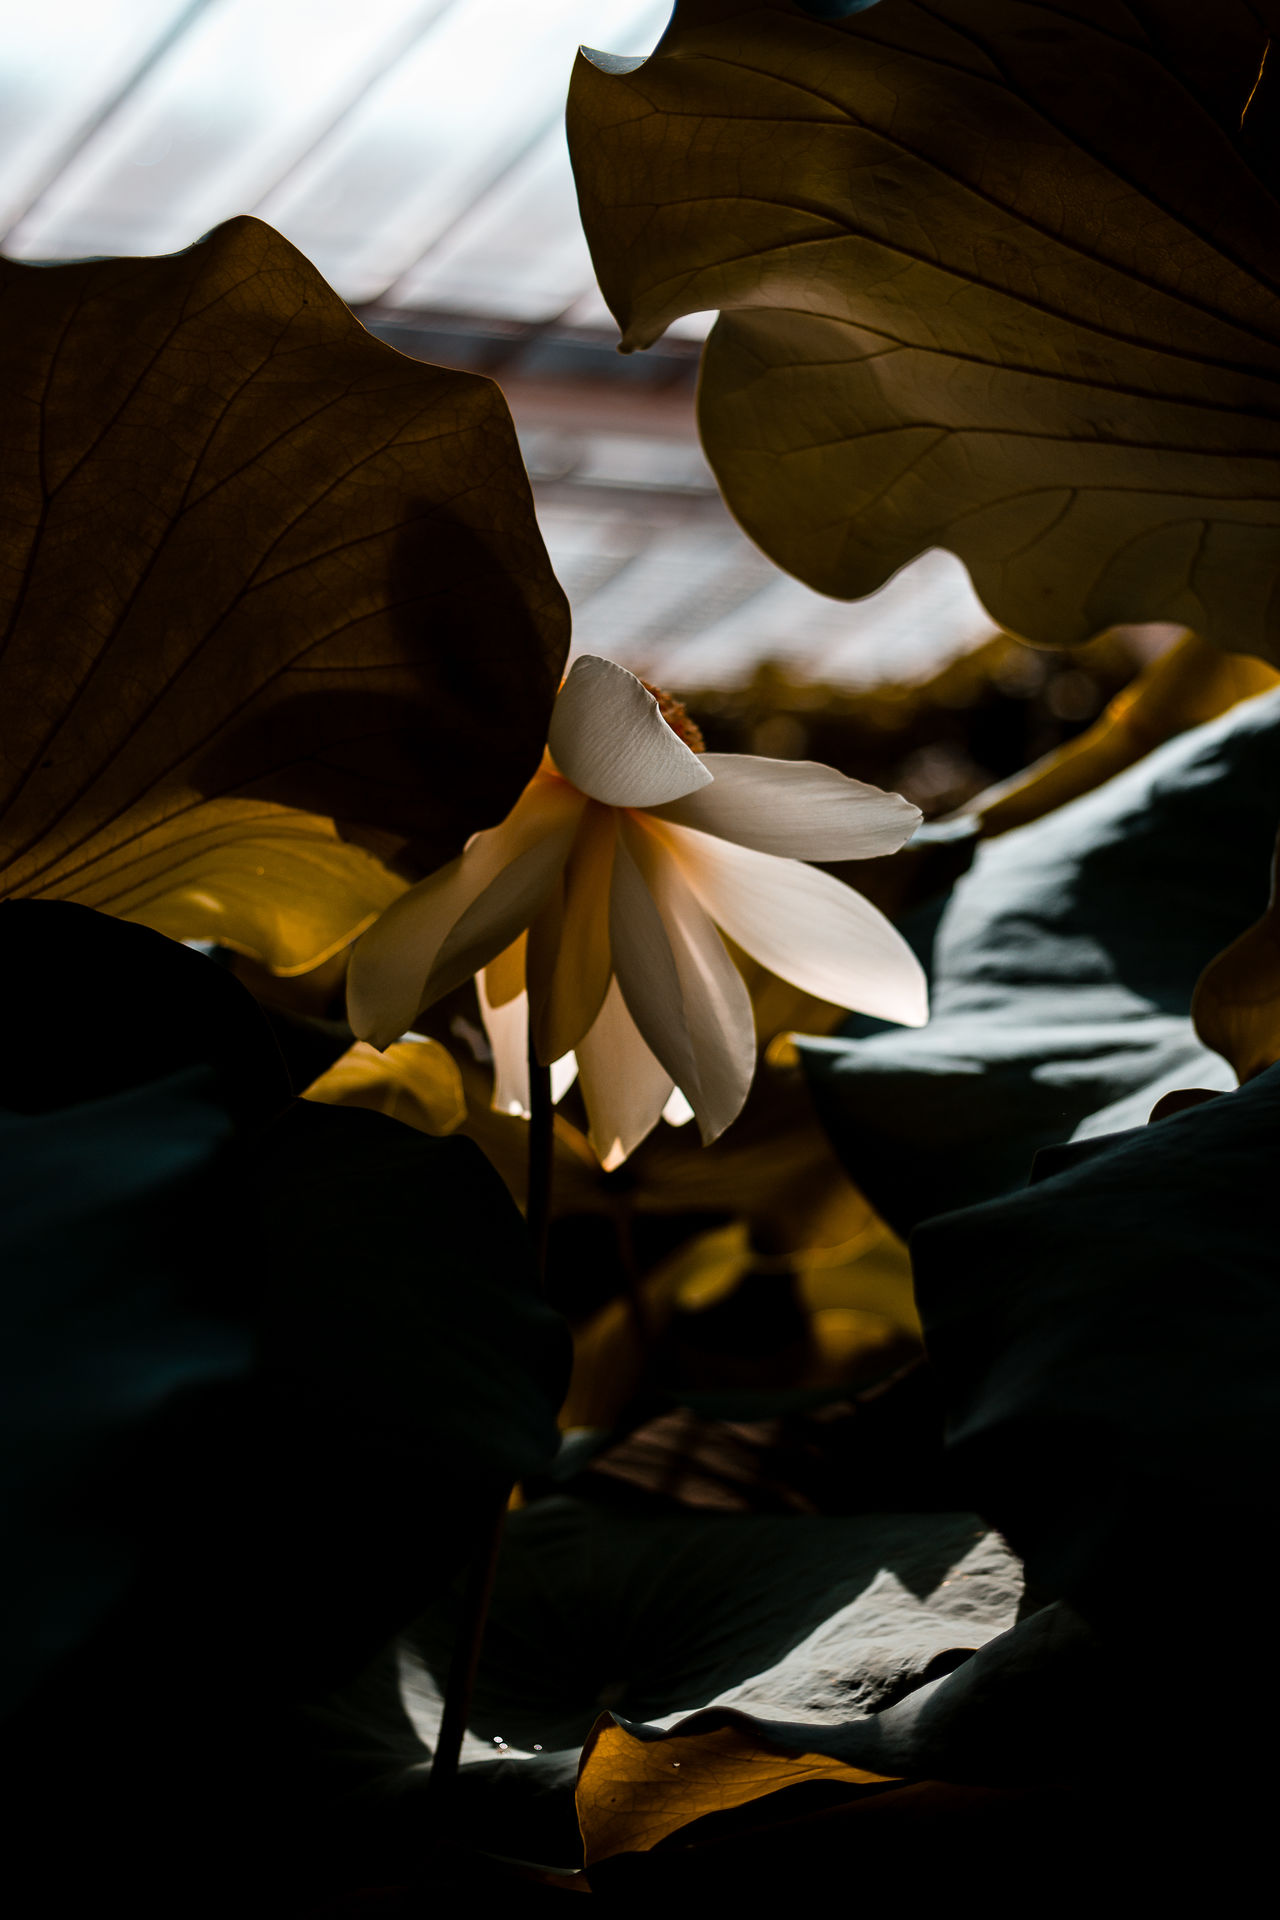 flowering plant, plant, flower, petal, beauty in nature